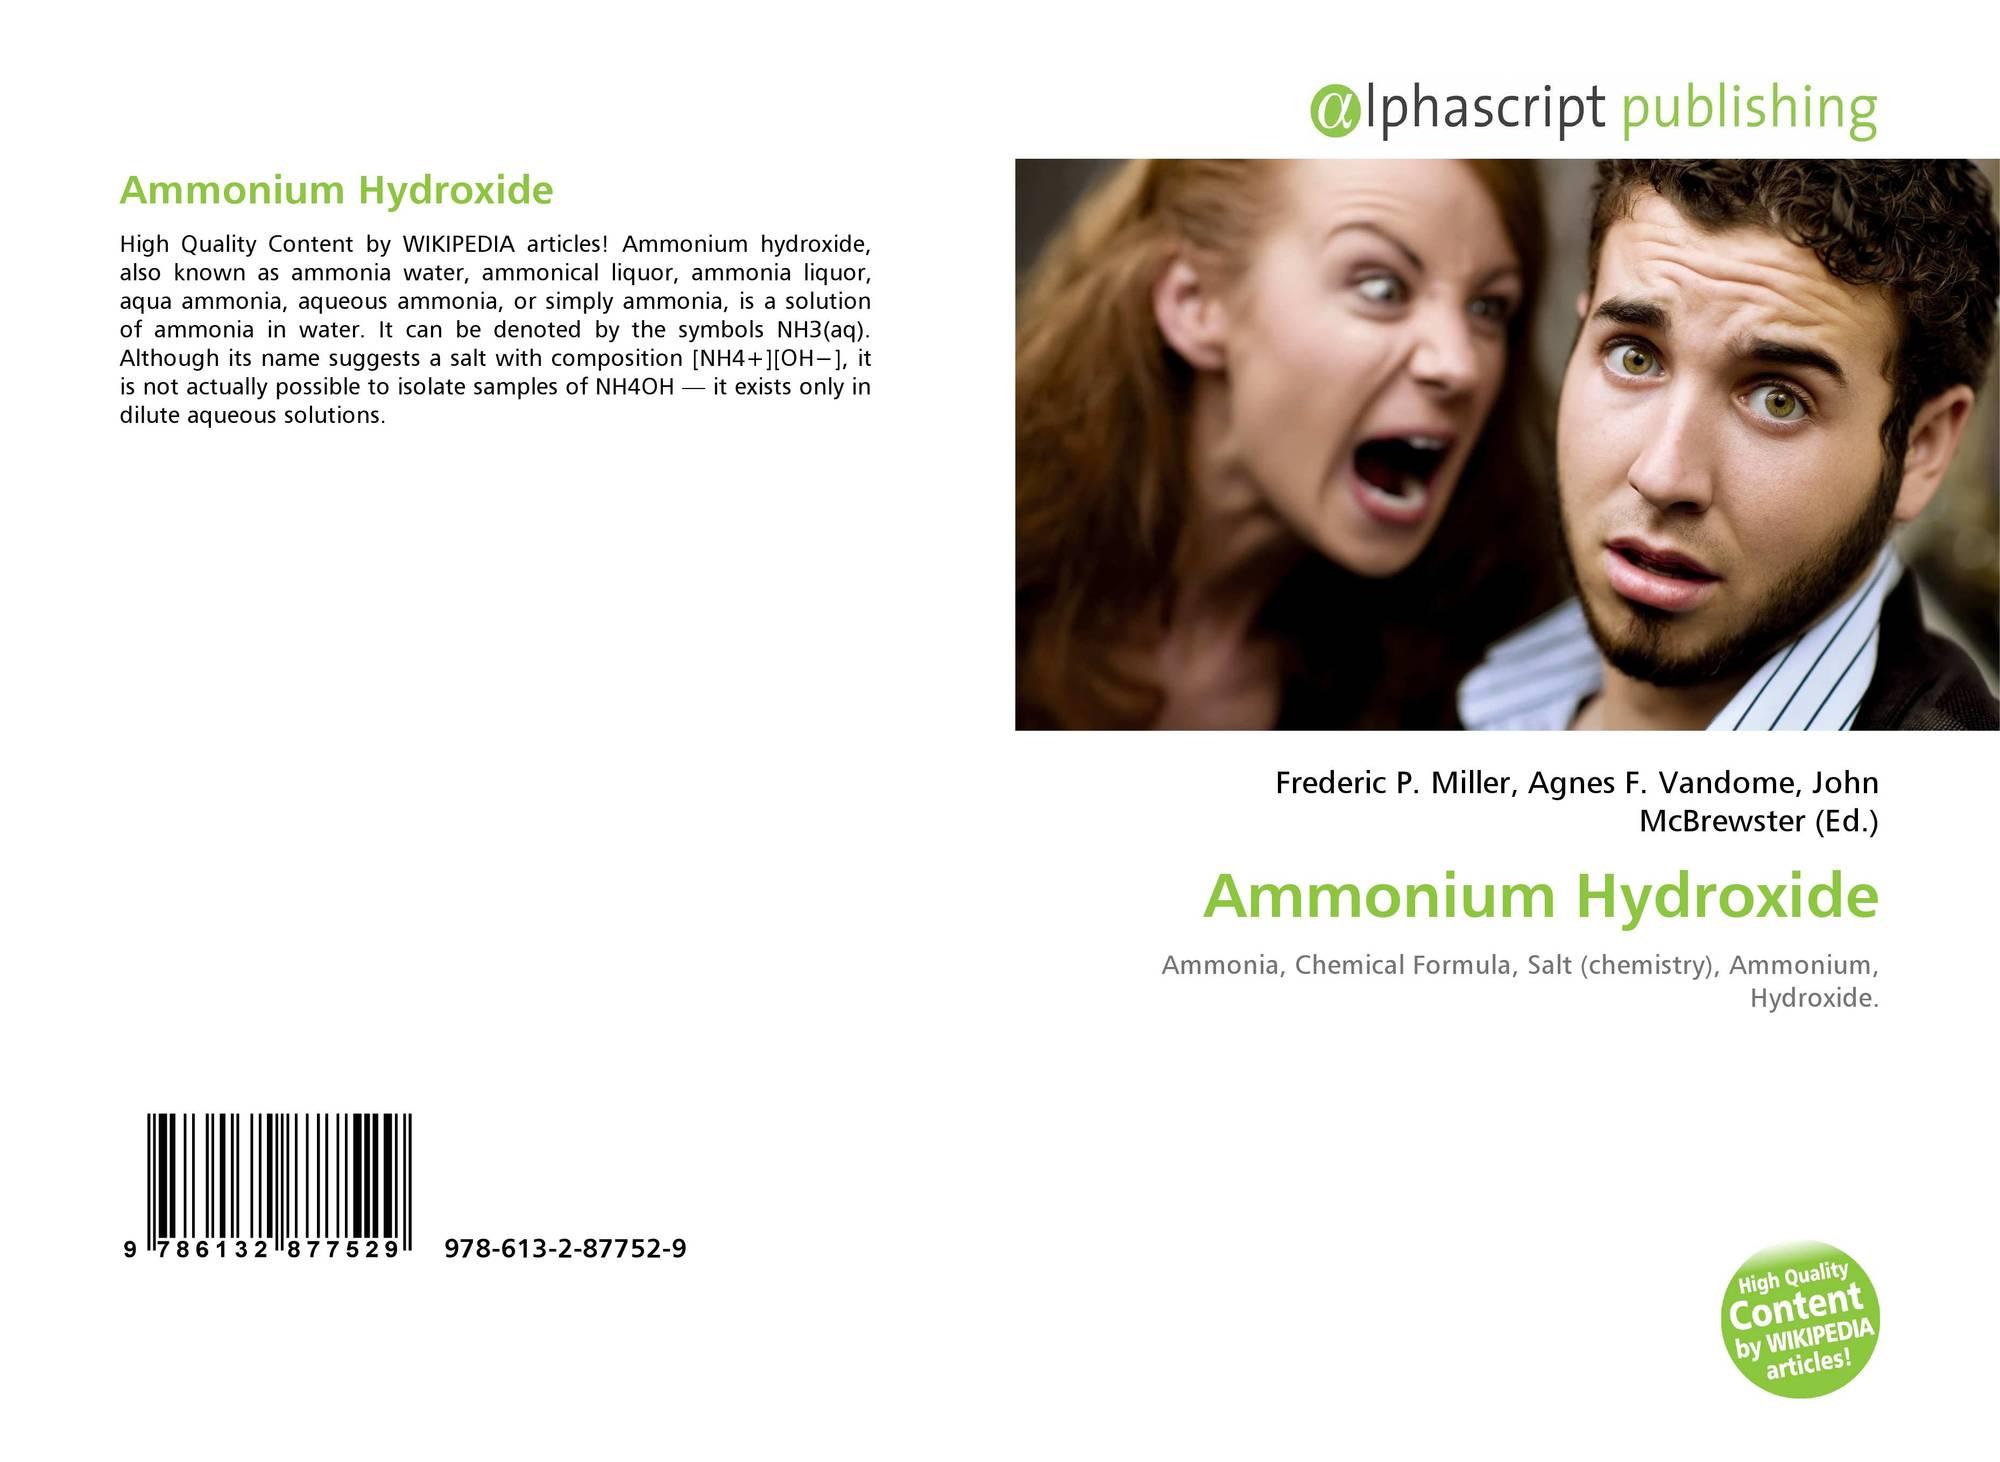 Ammonium Hydroxide 978 613 2 87752 9 6132877525 9786132877529